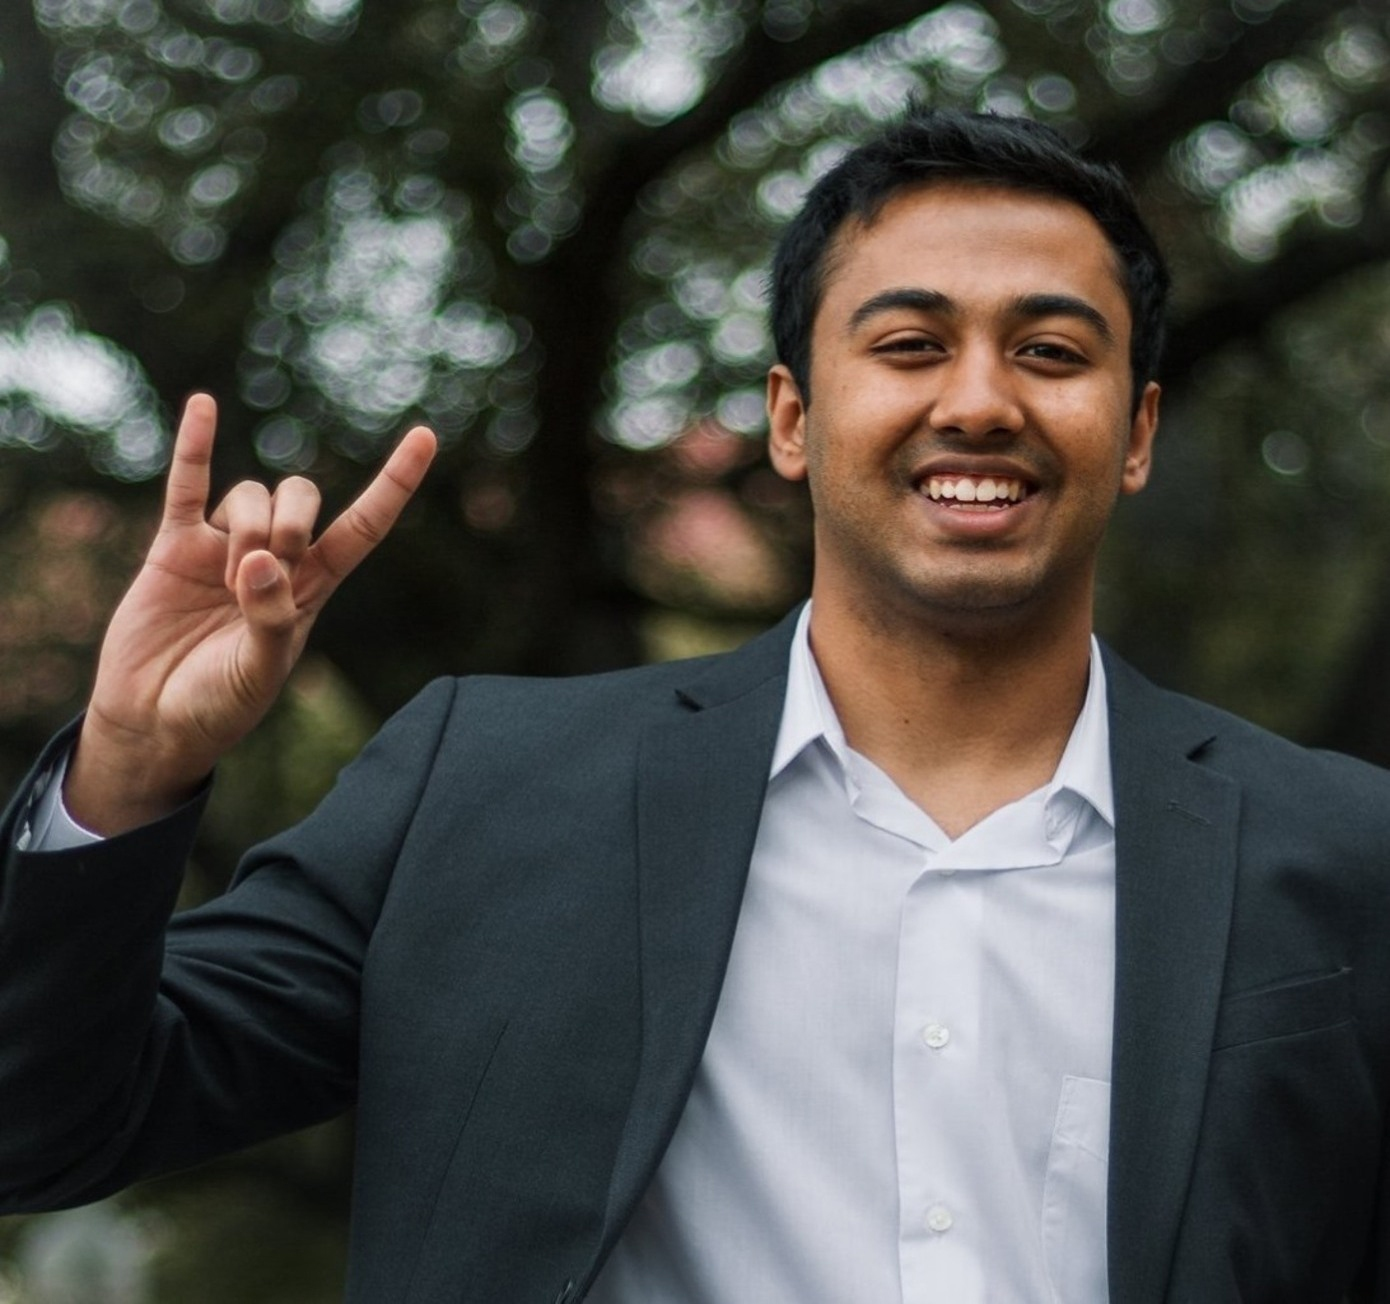 Undergraduate student Prajwal Gowda smiles and holds up the hook 'em hand sign.